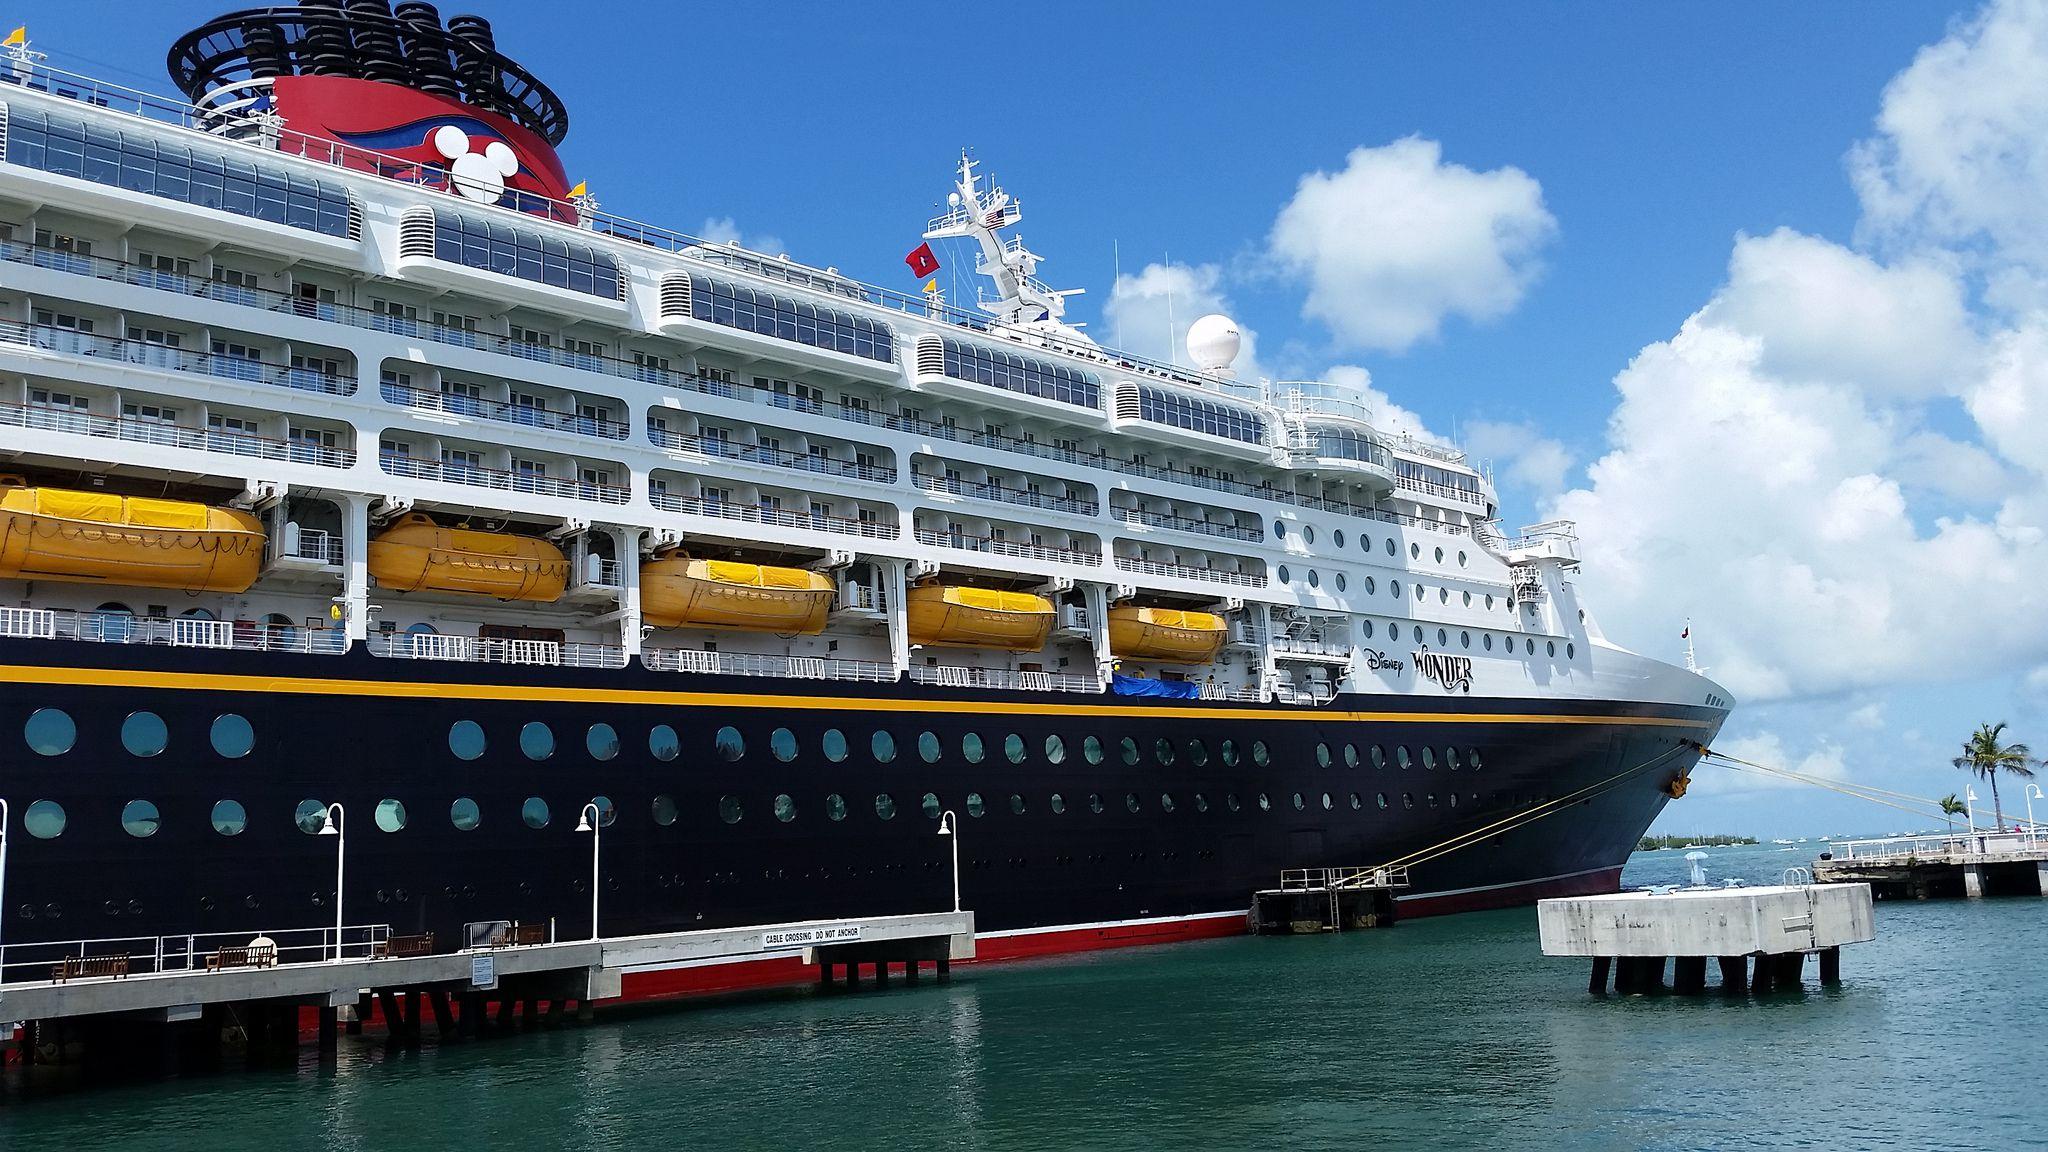 Disney Wonder Cruise Ship Profile And Photo Tour